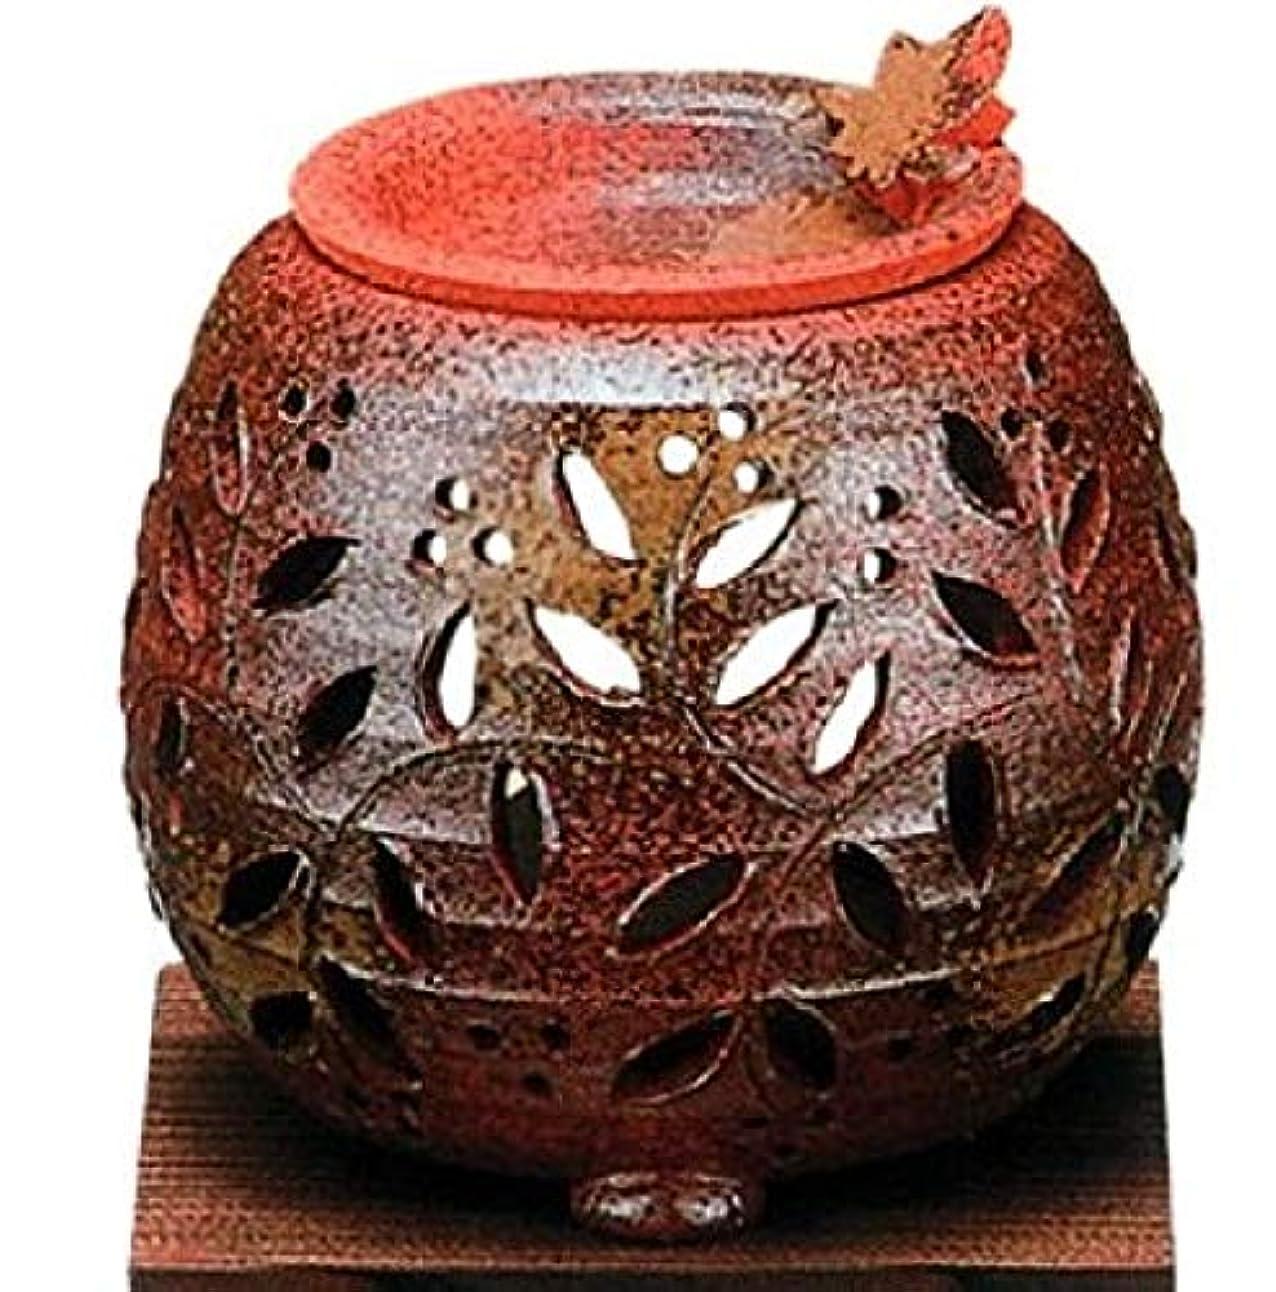 頼む嫌悪文房具常滑焼?石龍窯 カ38-12 茶香炉 タデ花 焼杉板付 約φ11×11cm